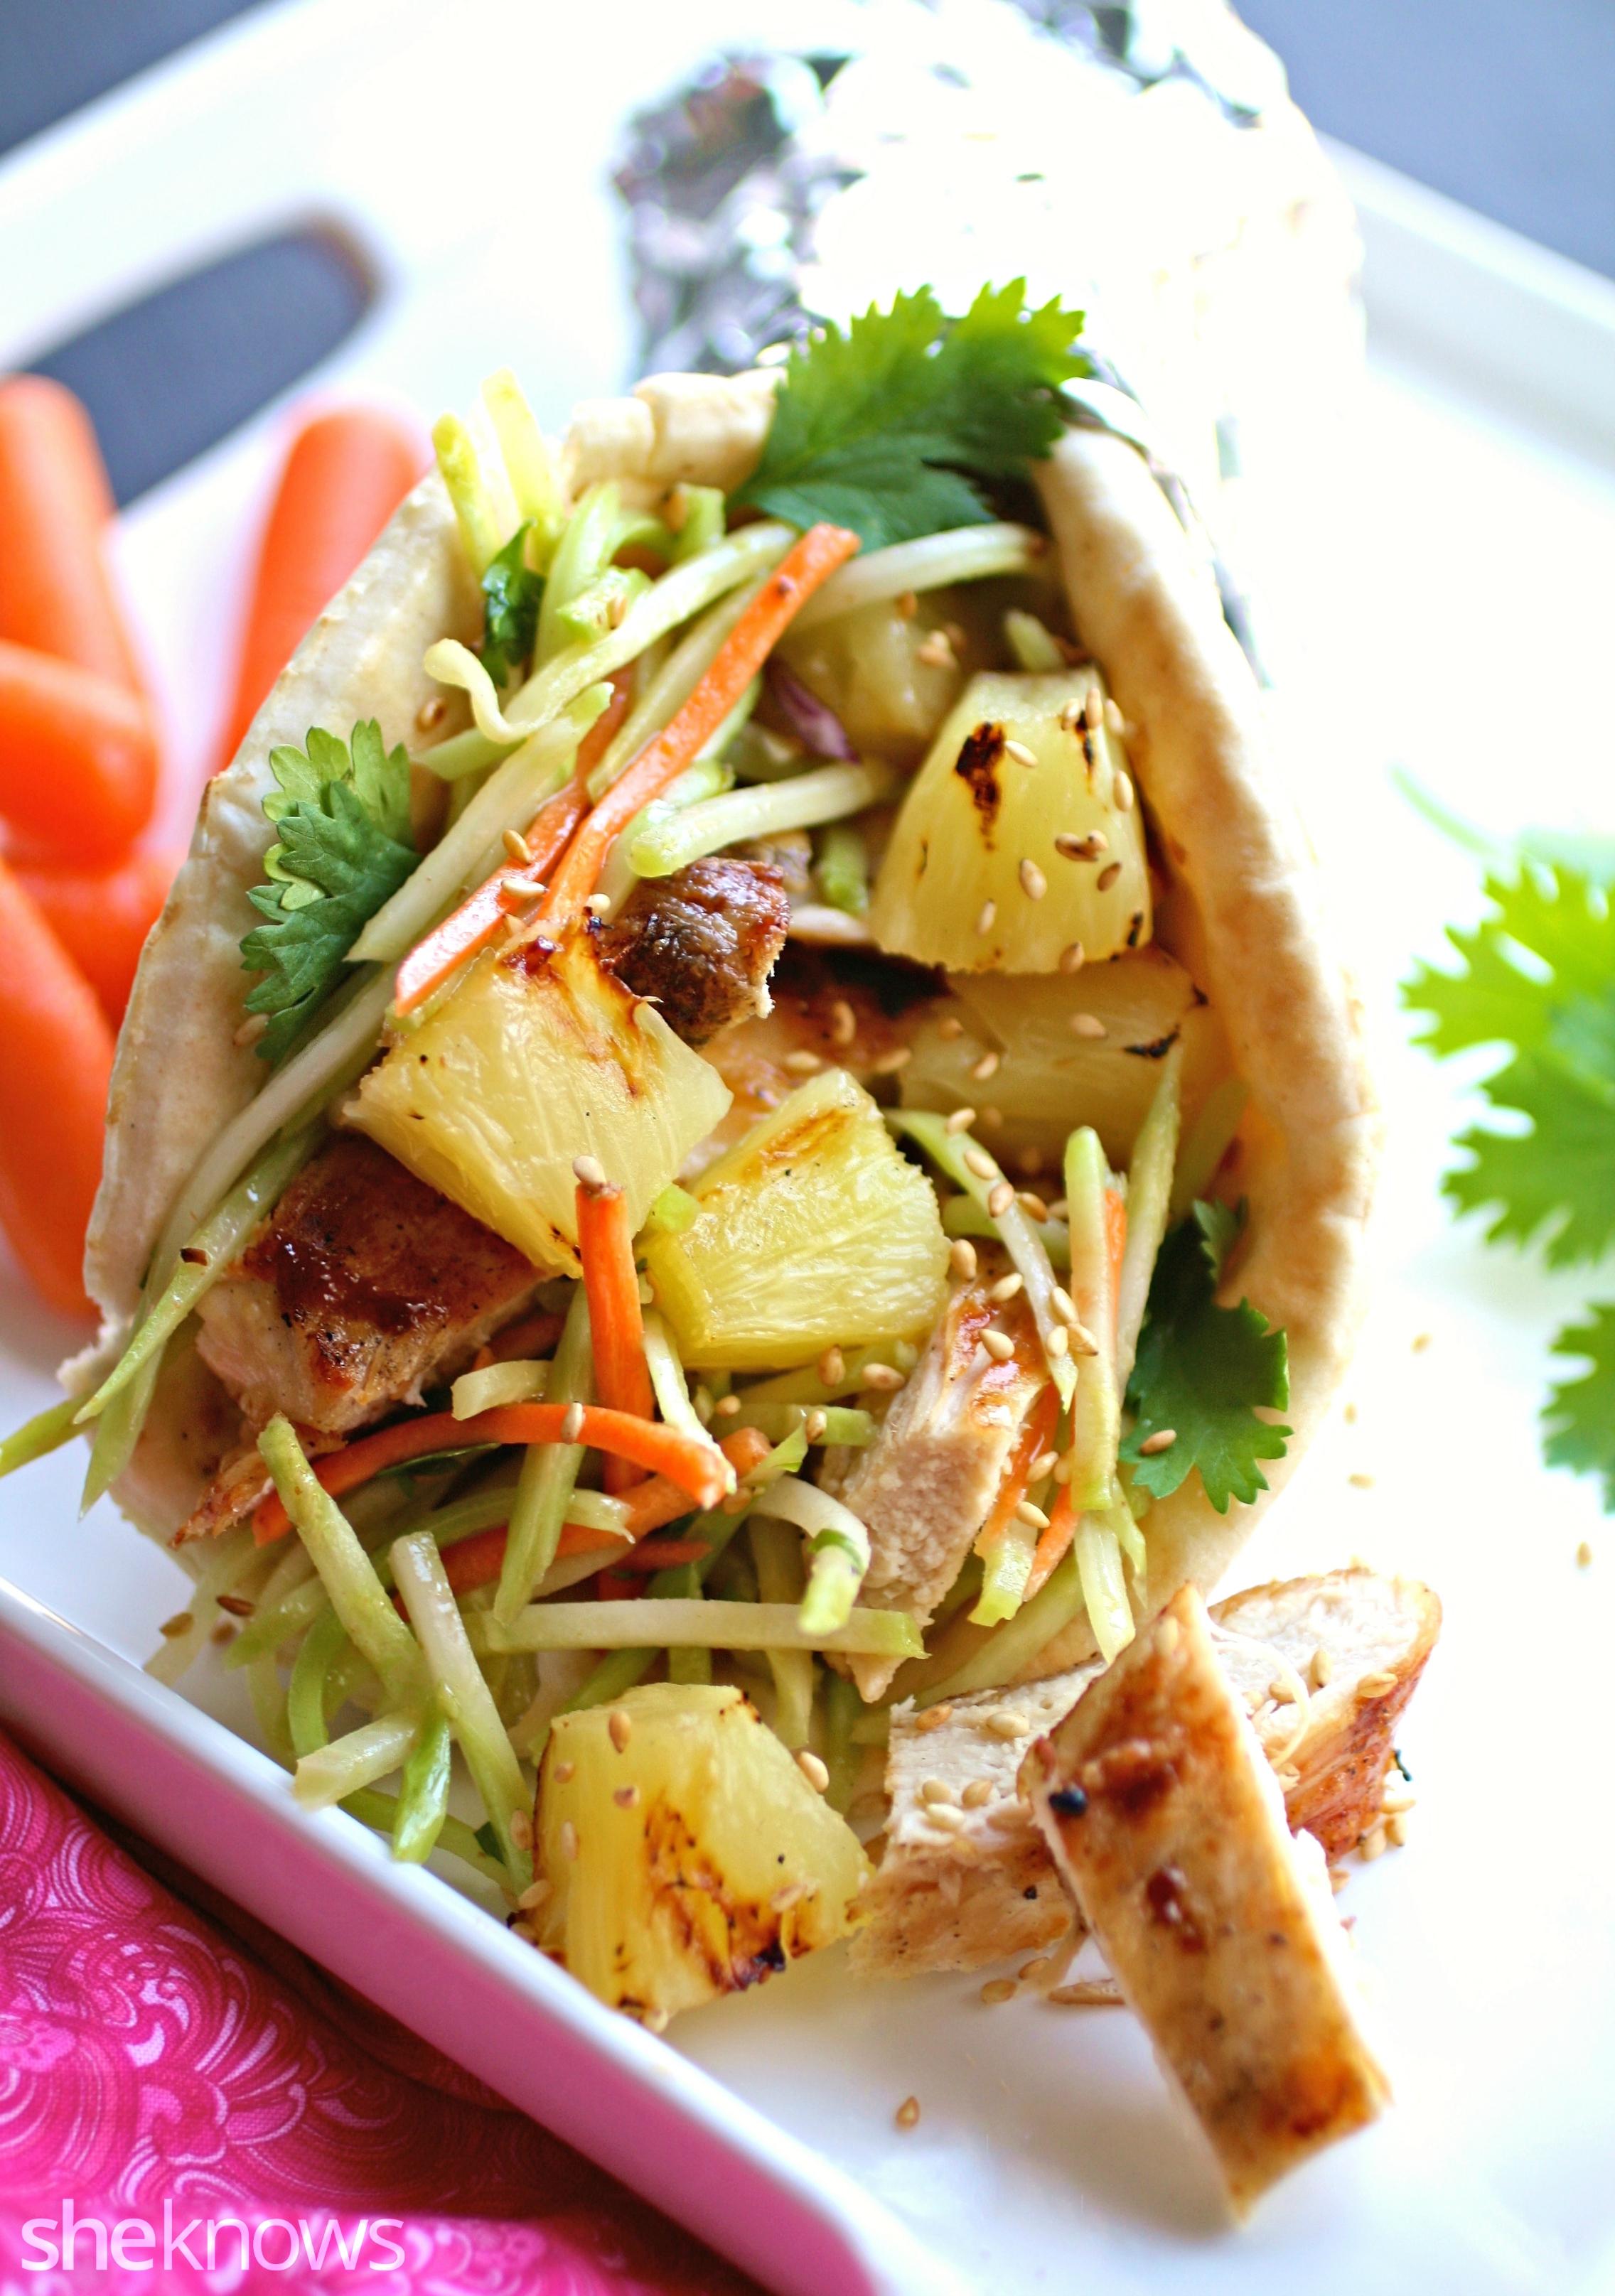 Grilled Chicken And Broccoli Slaw Wraps Recipe — Dishmaps